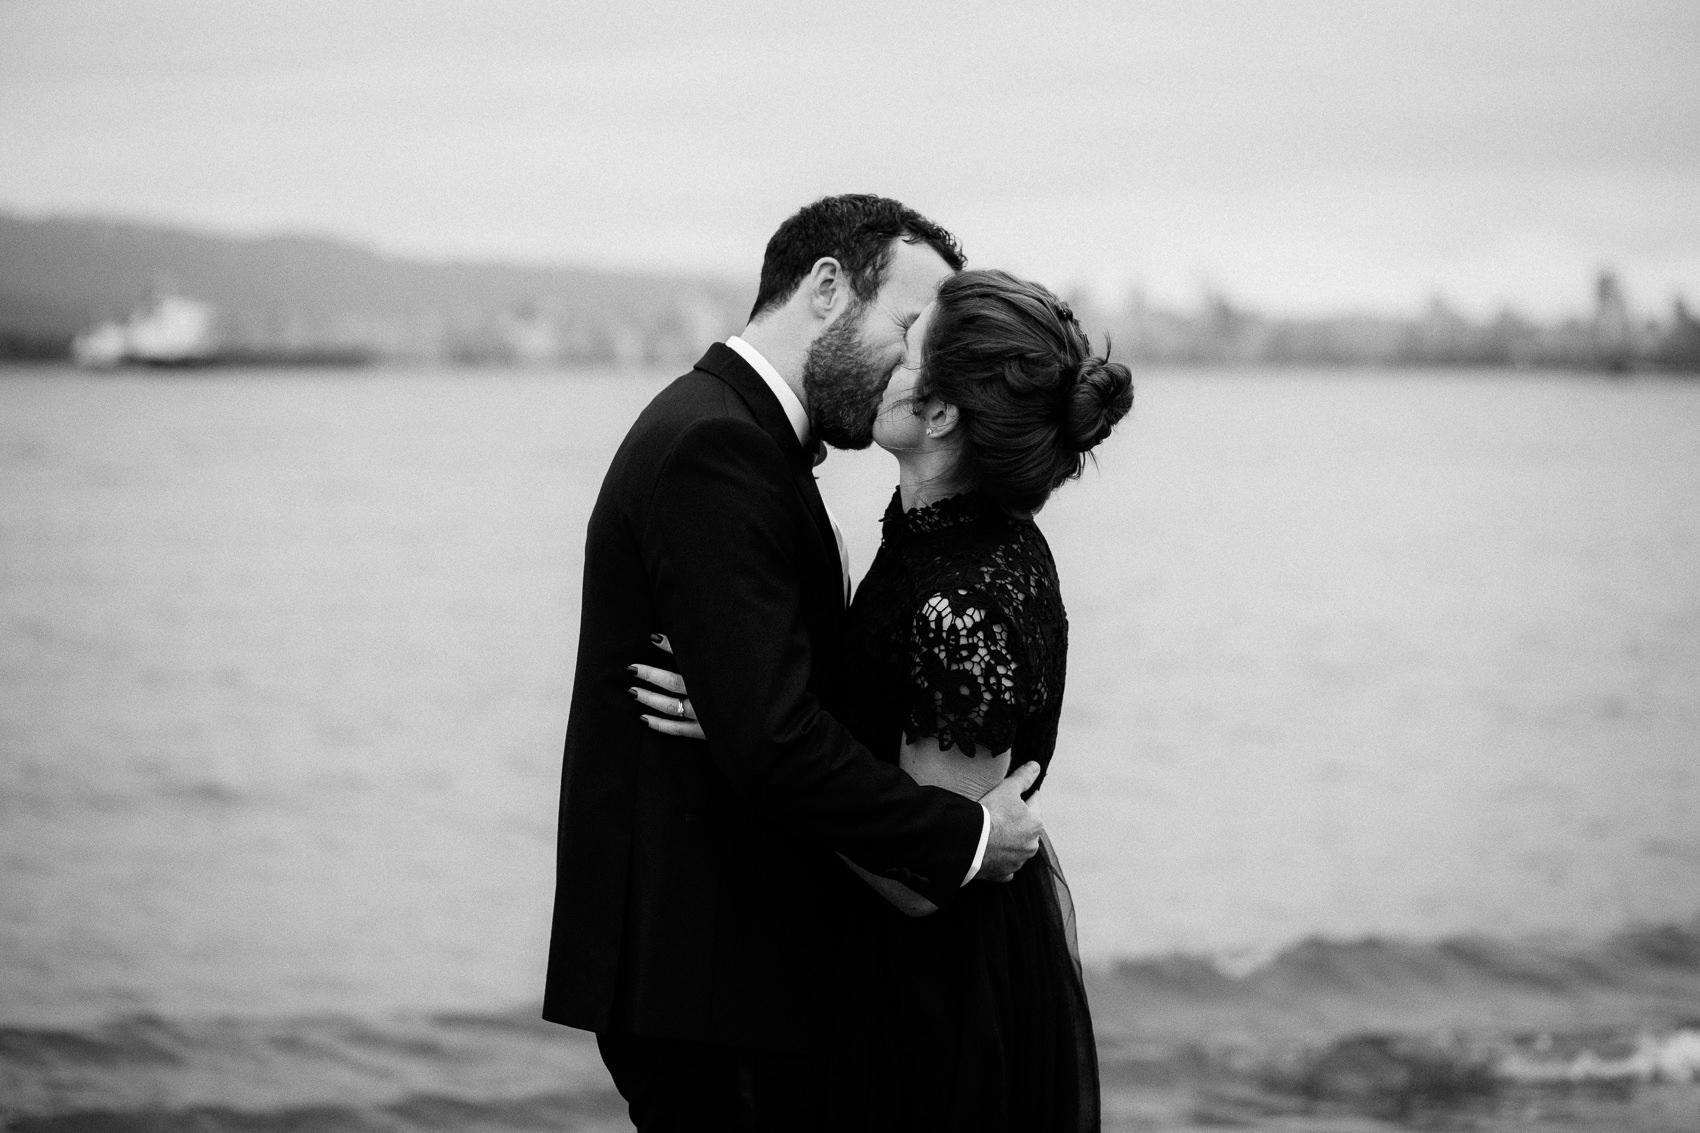 spanish-banks-elopement-wedding-ceremony.jPG